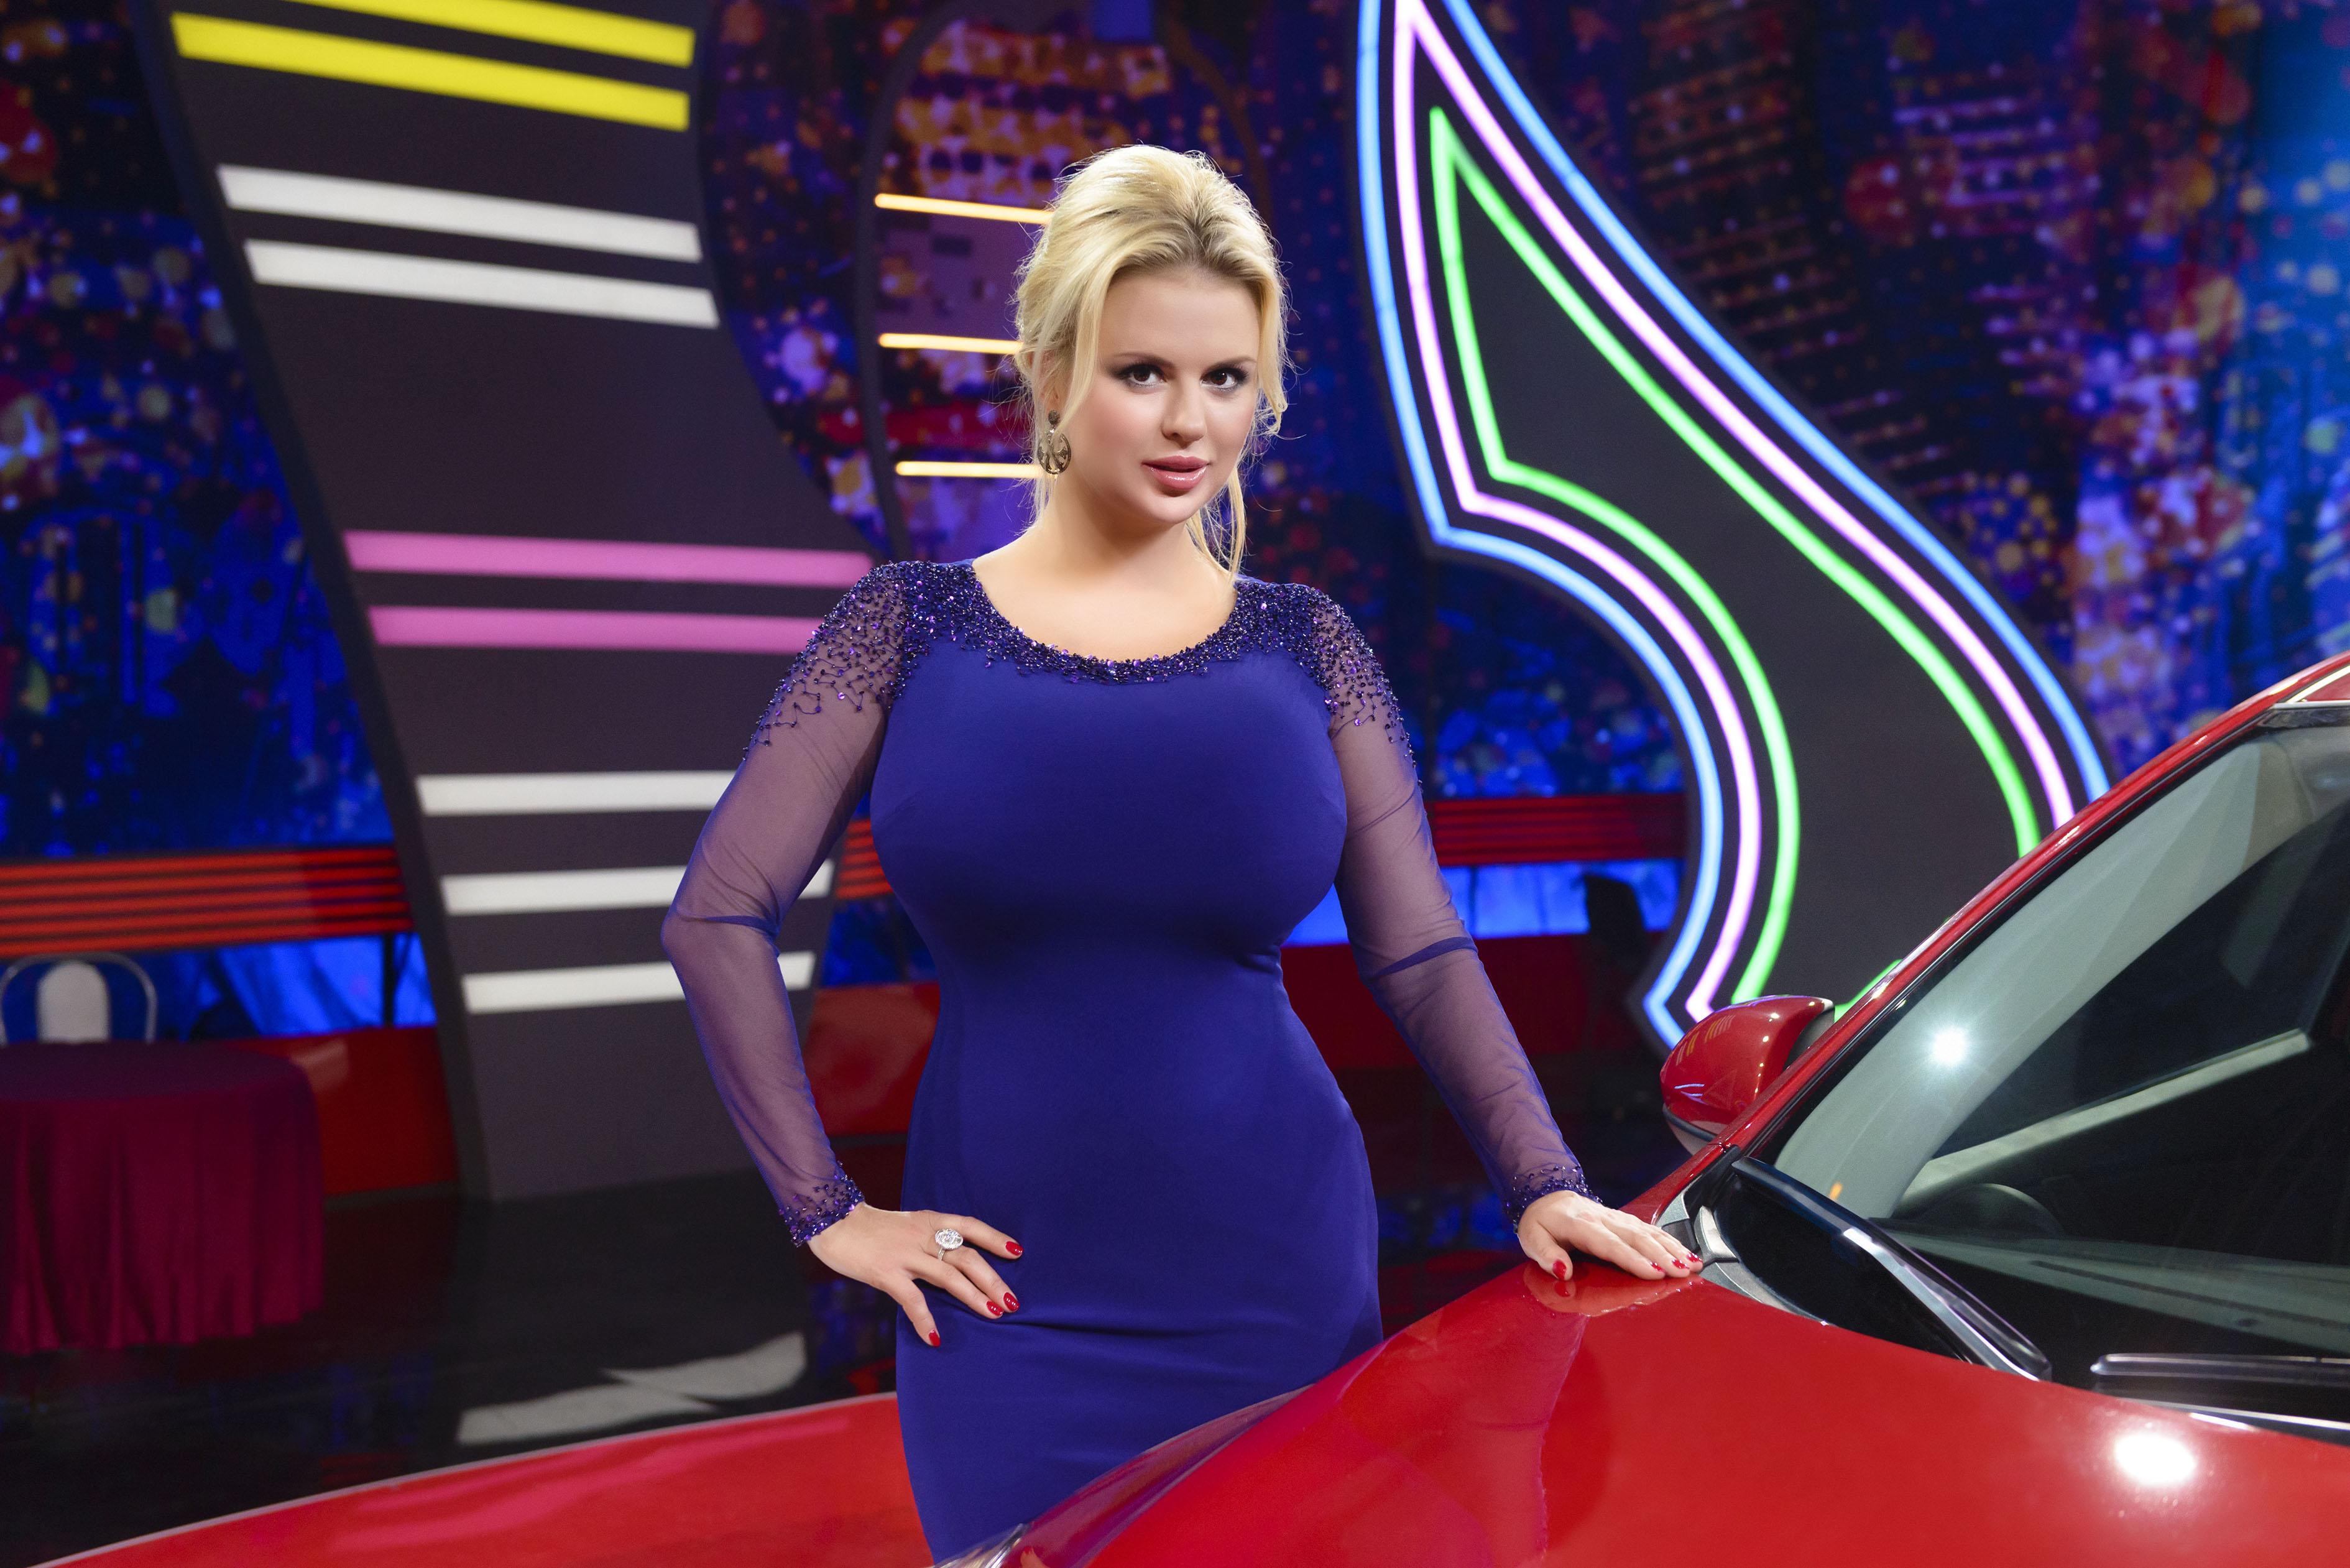 Анна Семенович живет яркой жизнью